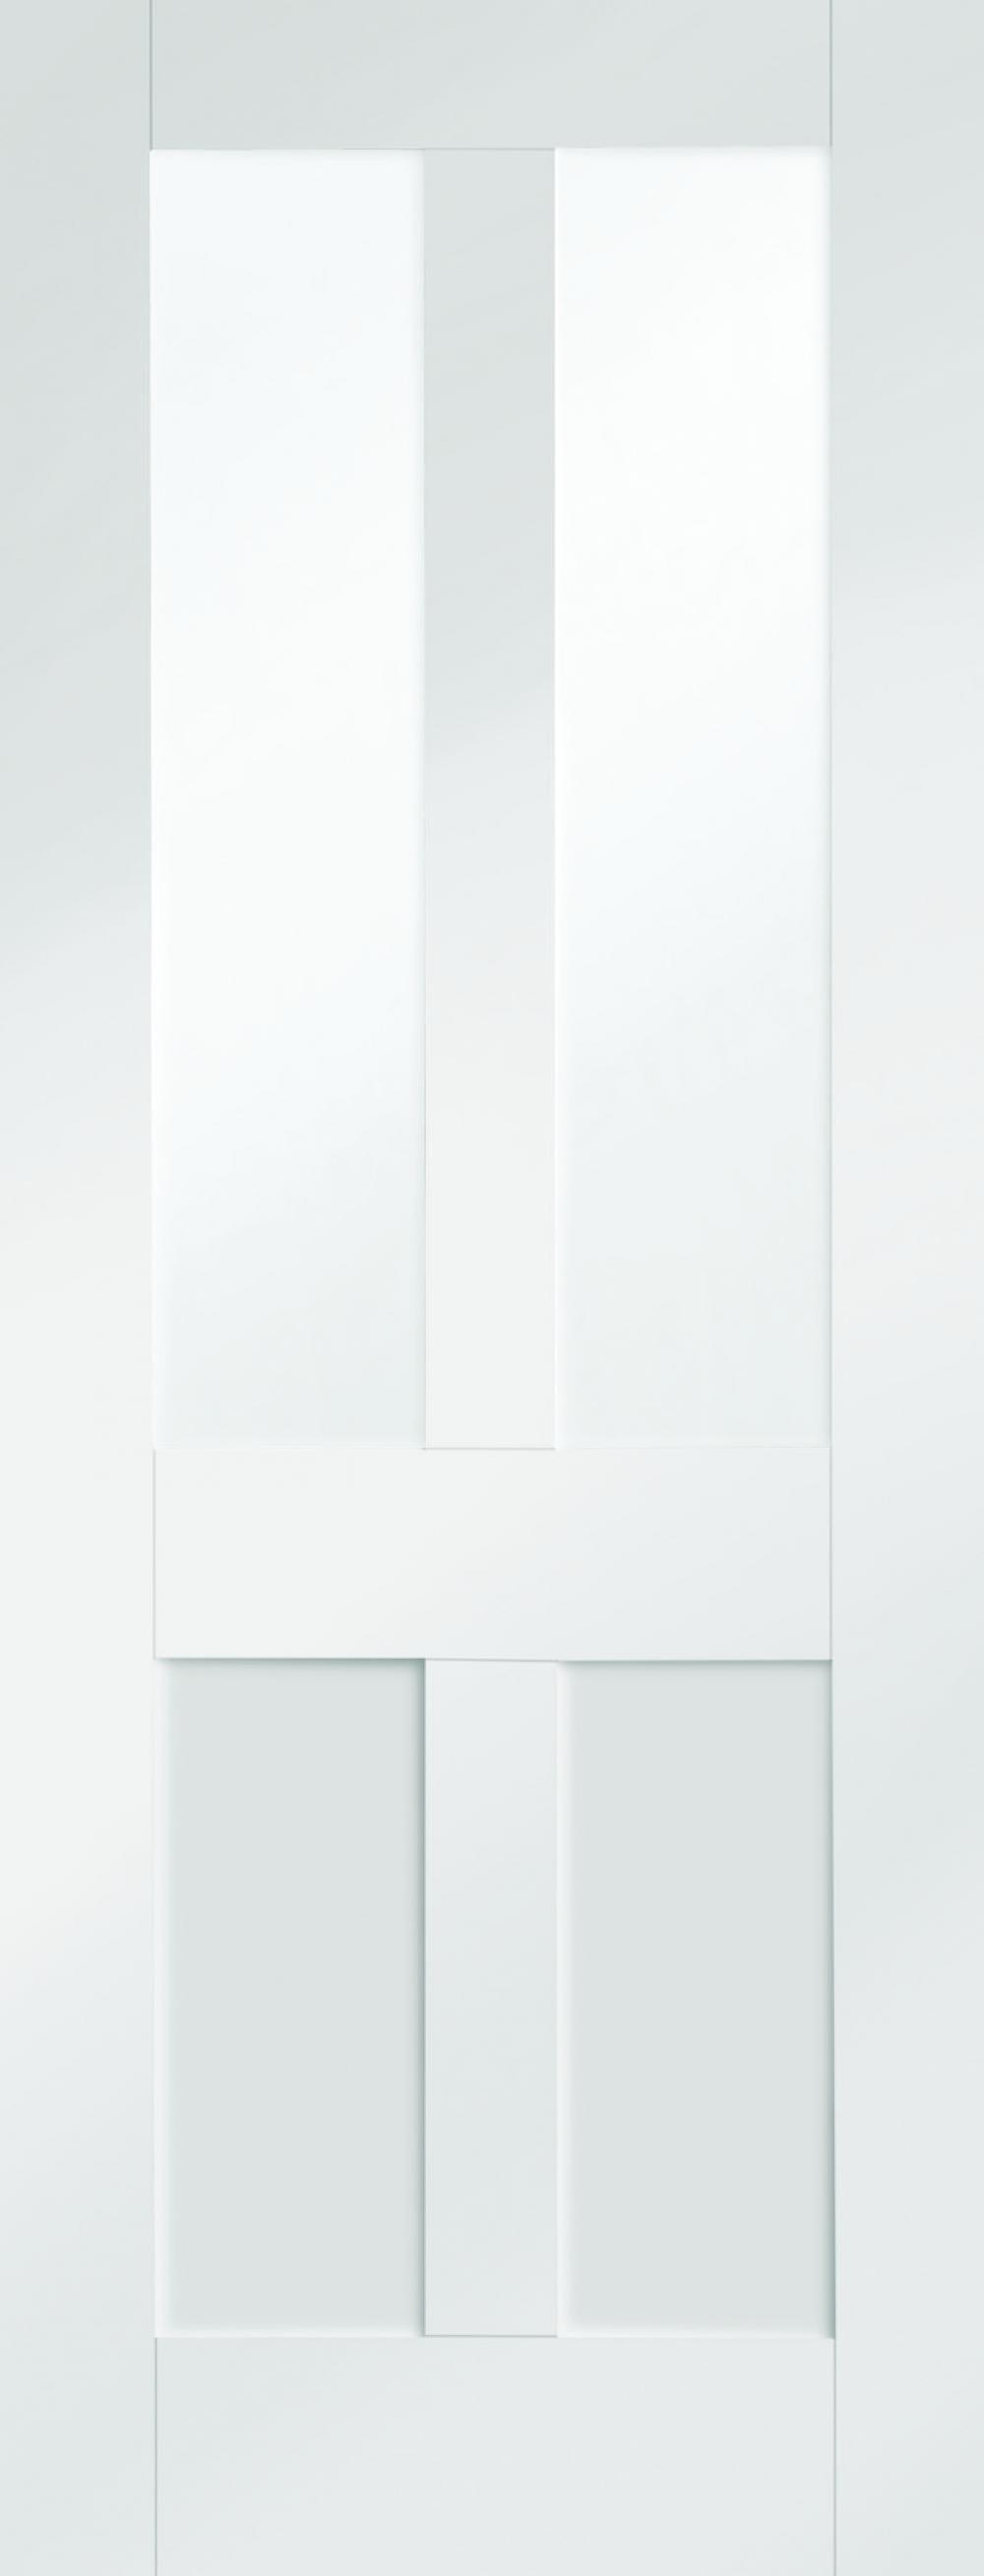 Malton Shaker White - Clear Glass Image